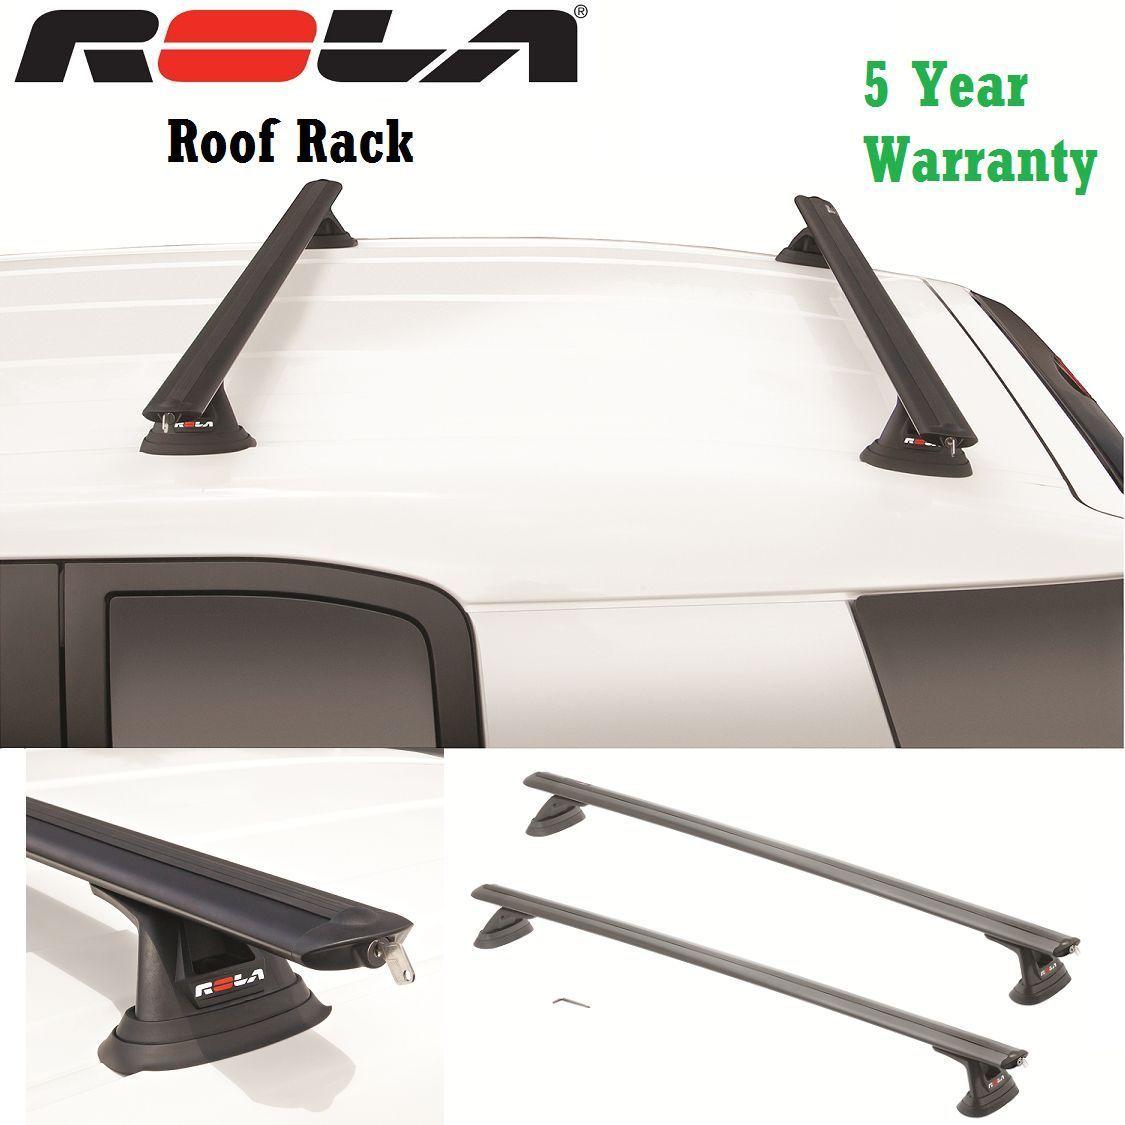 Rola Custm Fit Alumnum Roof Rack 01 13 And Similar Items